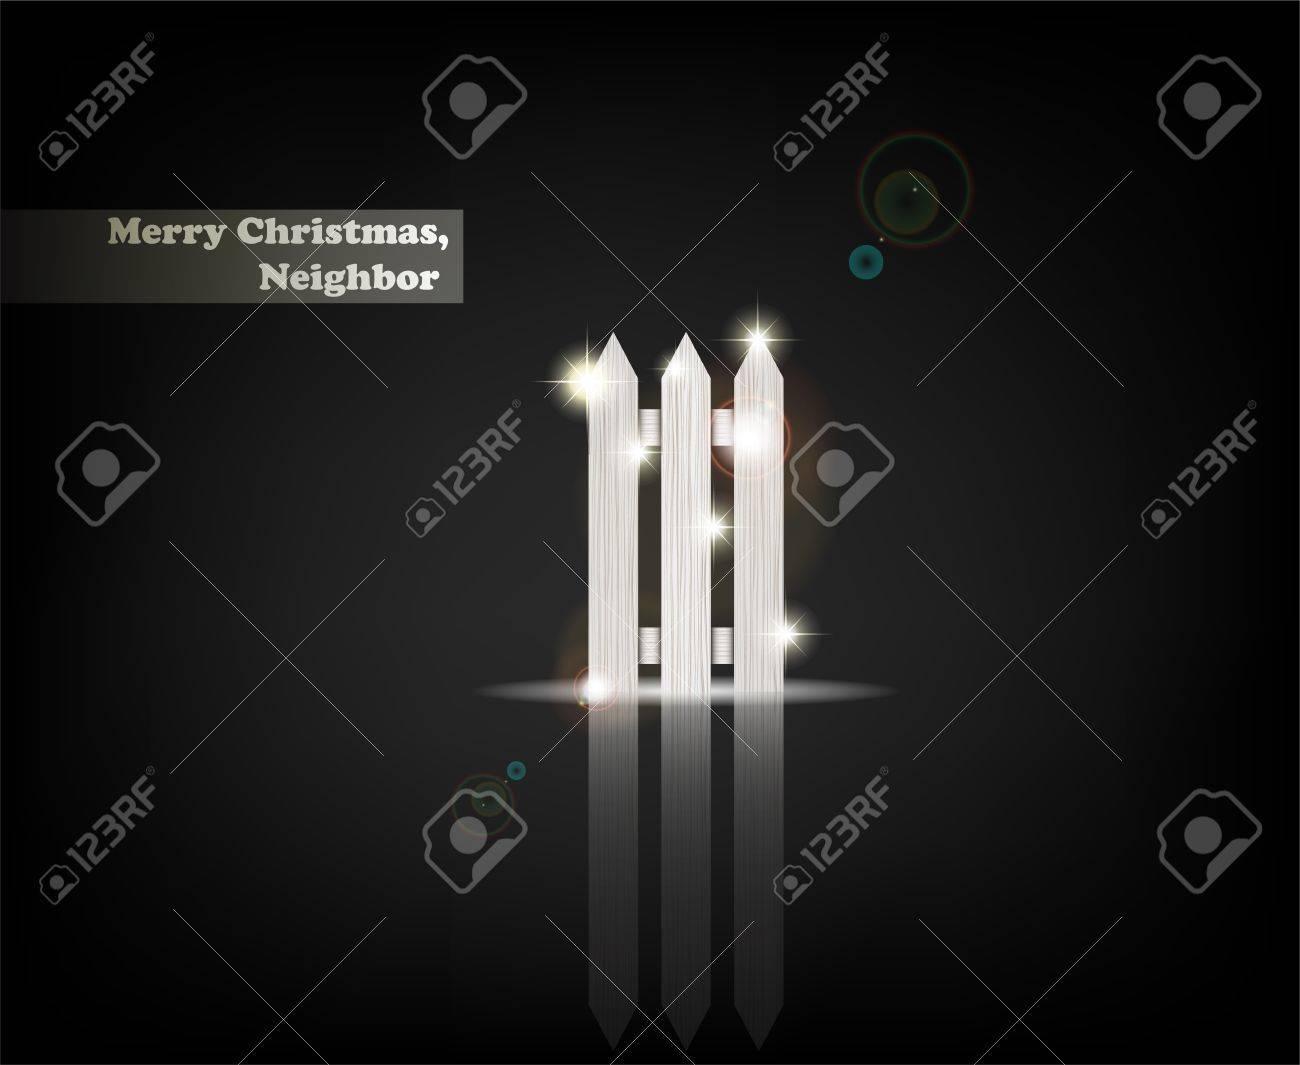 Merry Christmas, Neighbor\